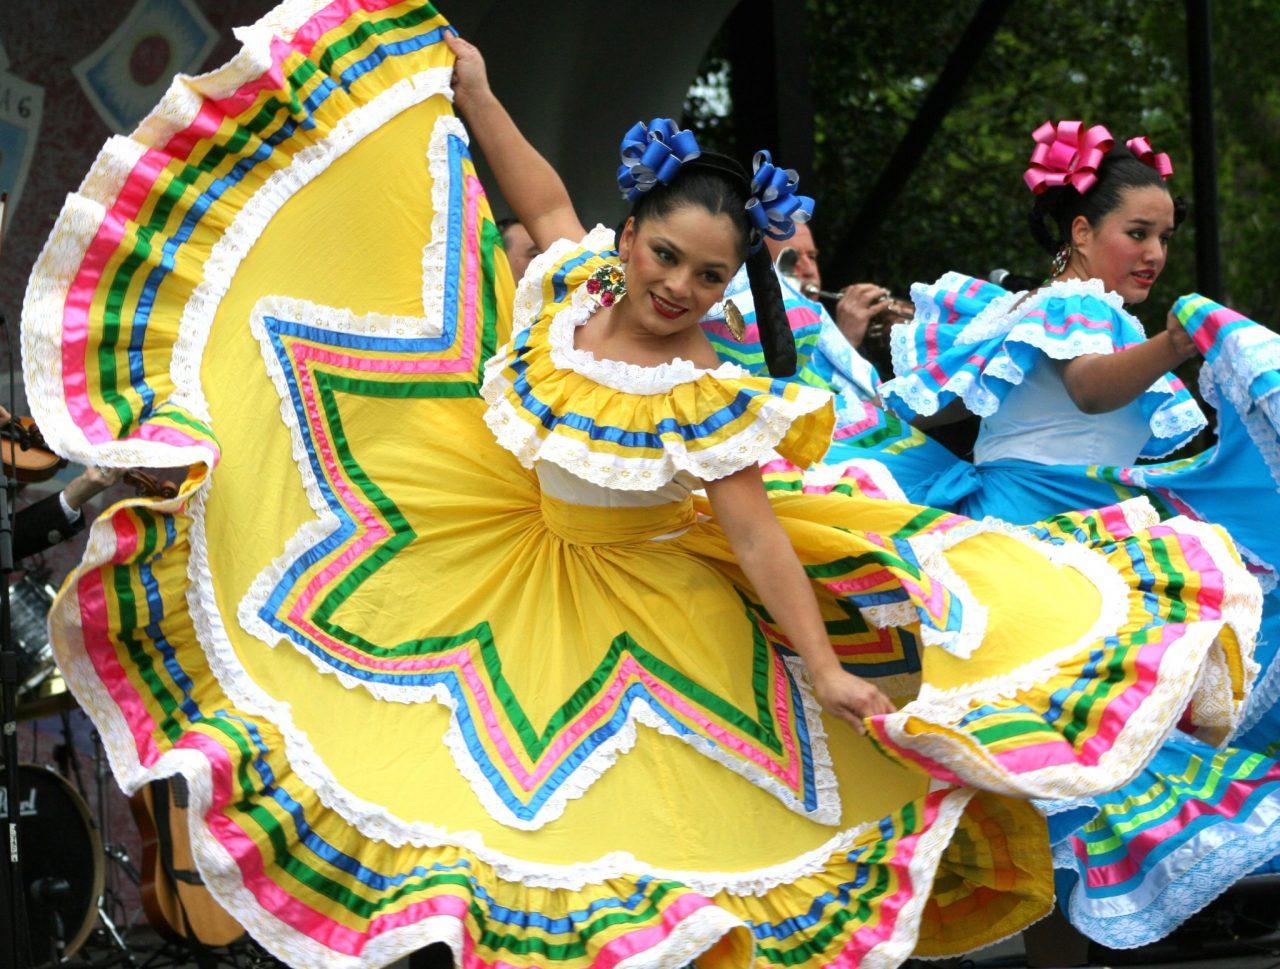 Best Cinco de Mayo Celebrations in the U.S.